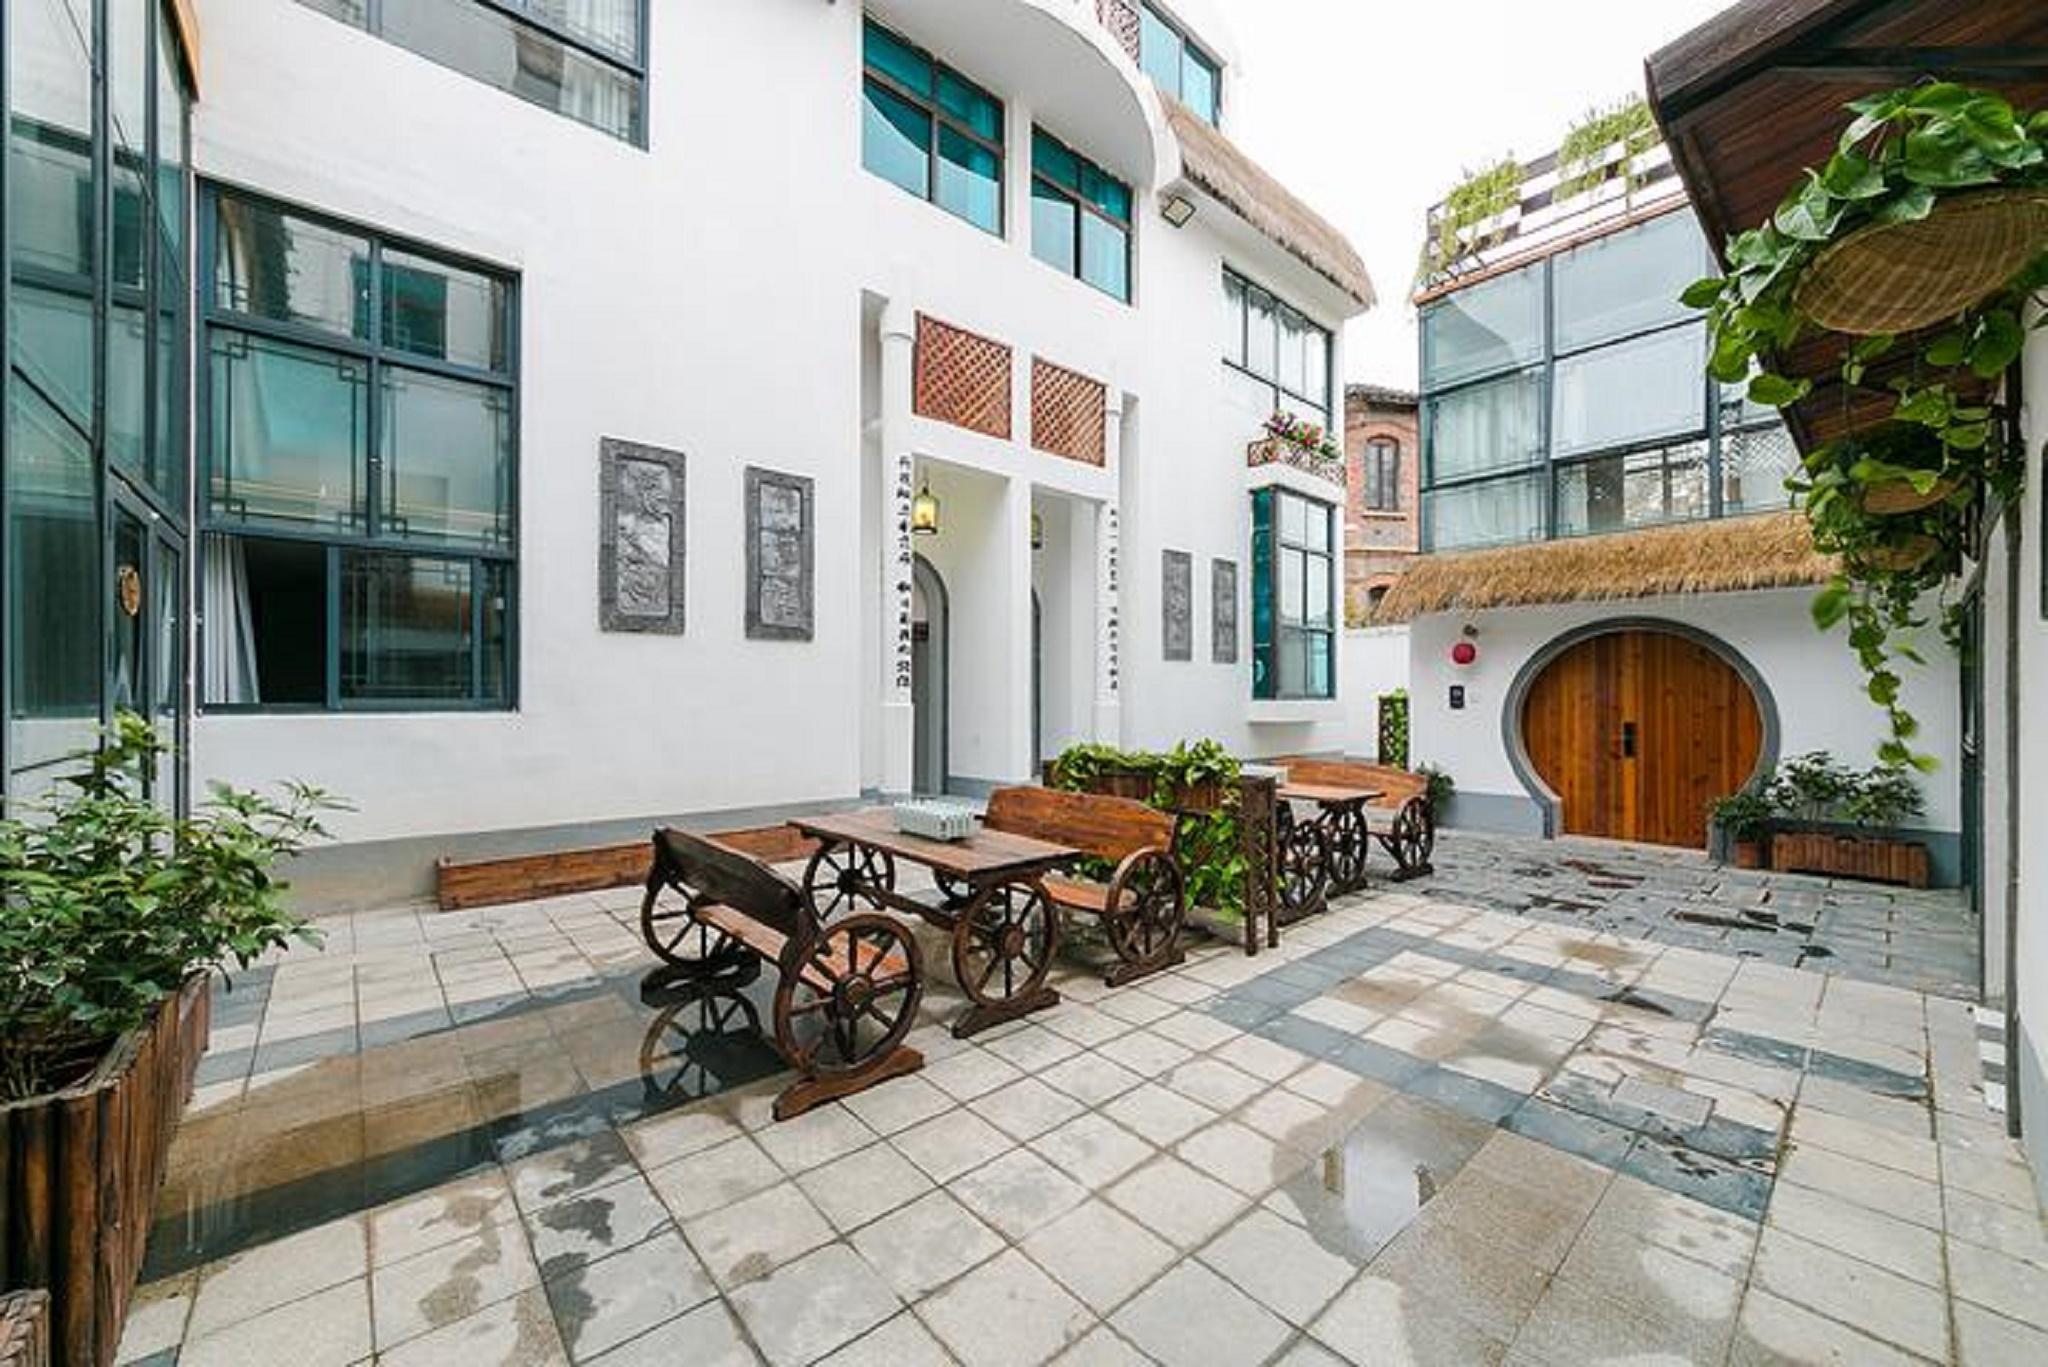 Su She courtyadr Hotel Suzhou – Hotel Reviews, Photos & Room Rates